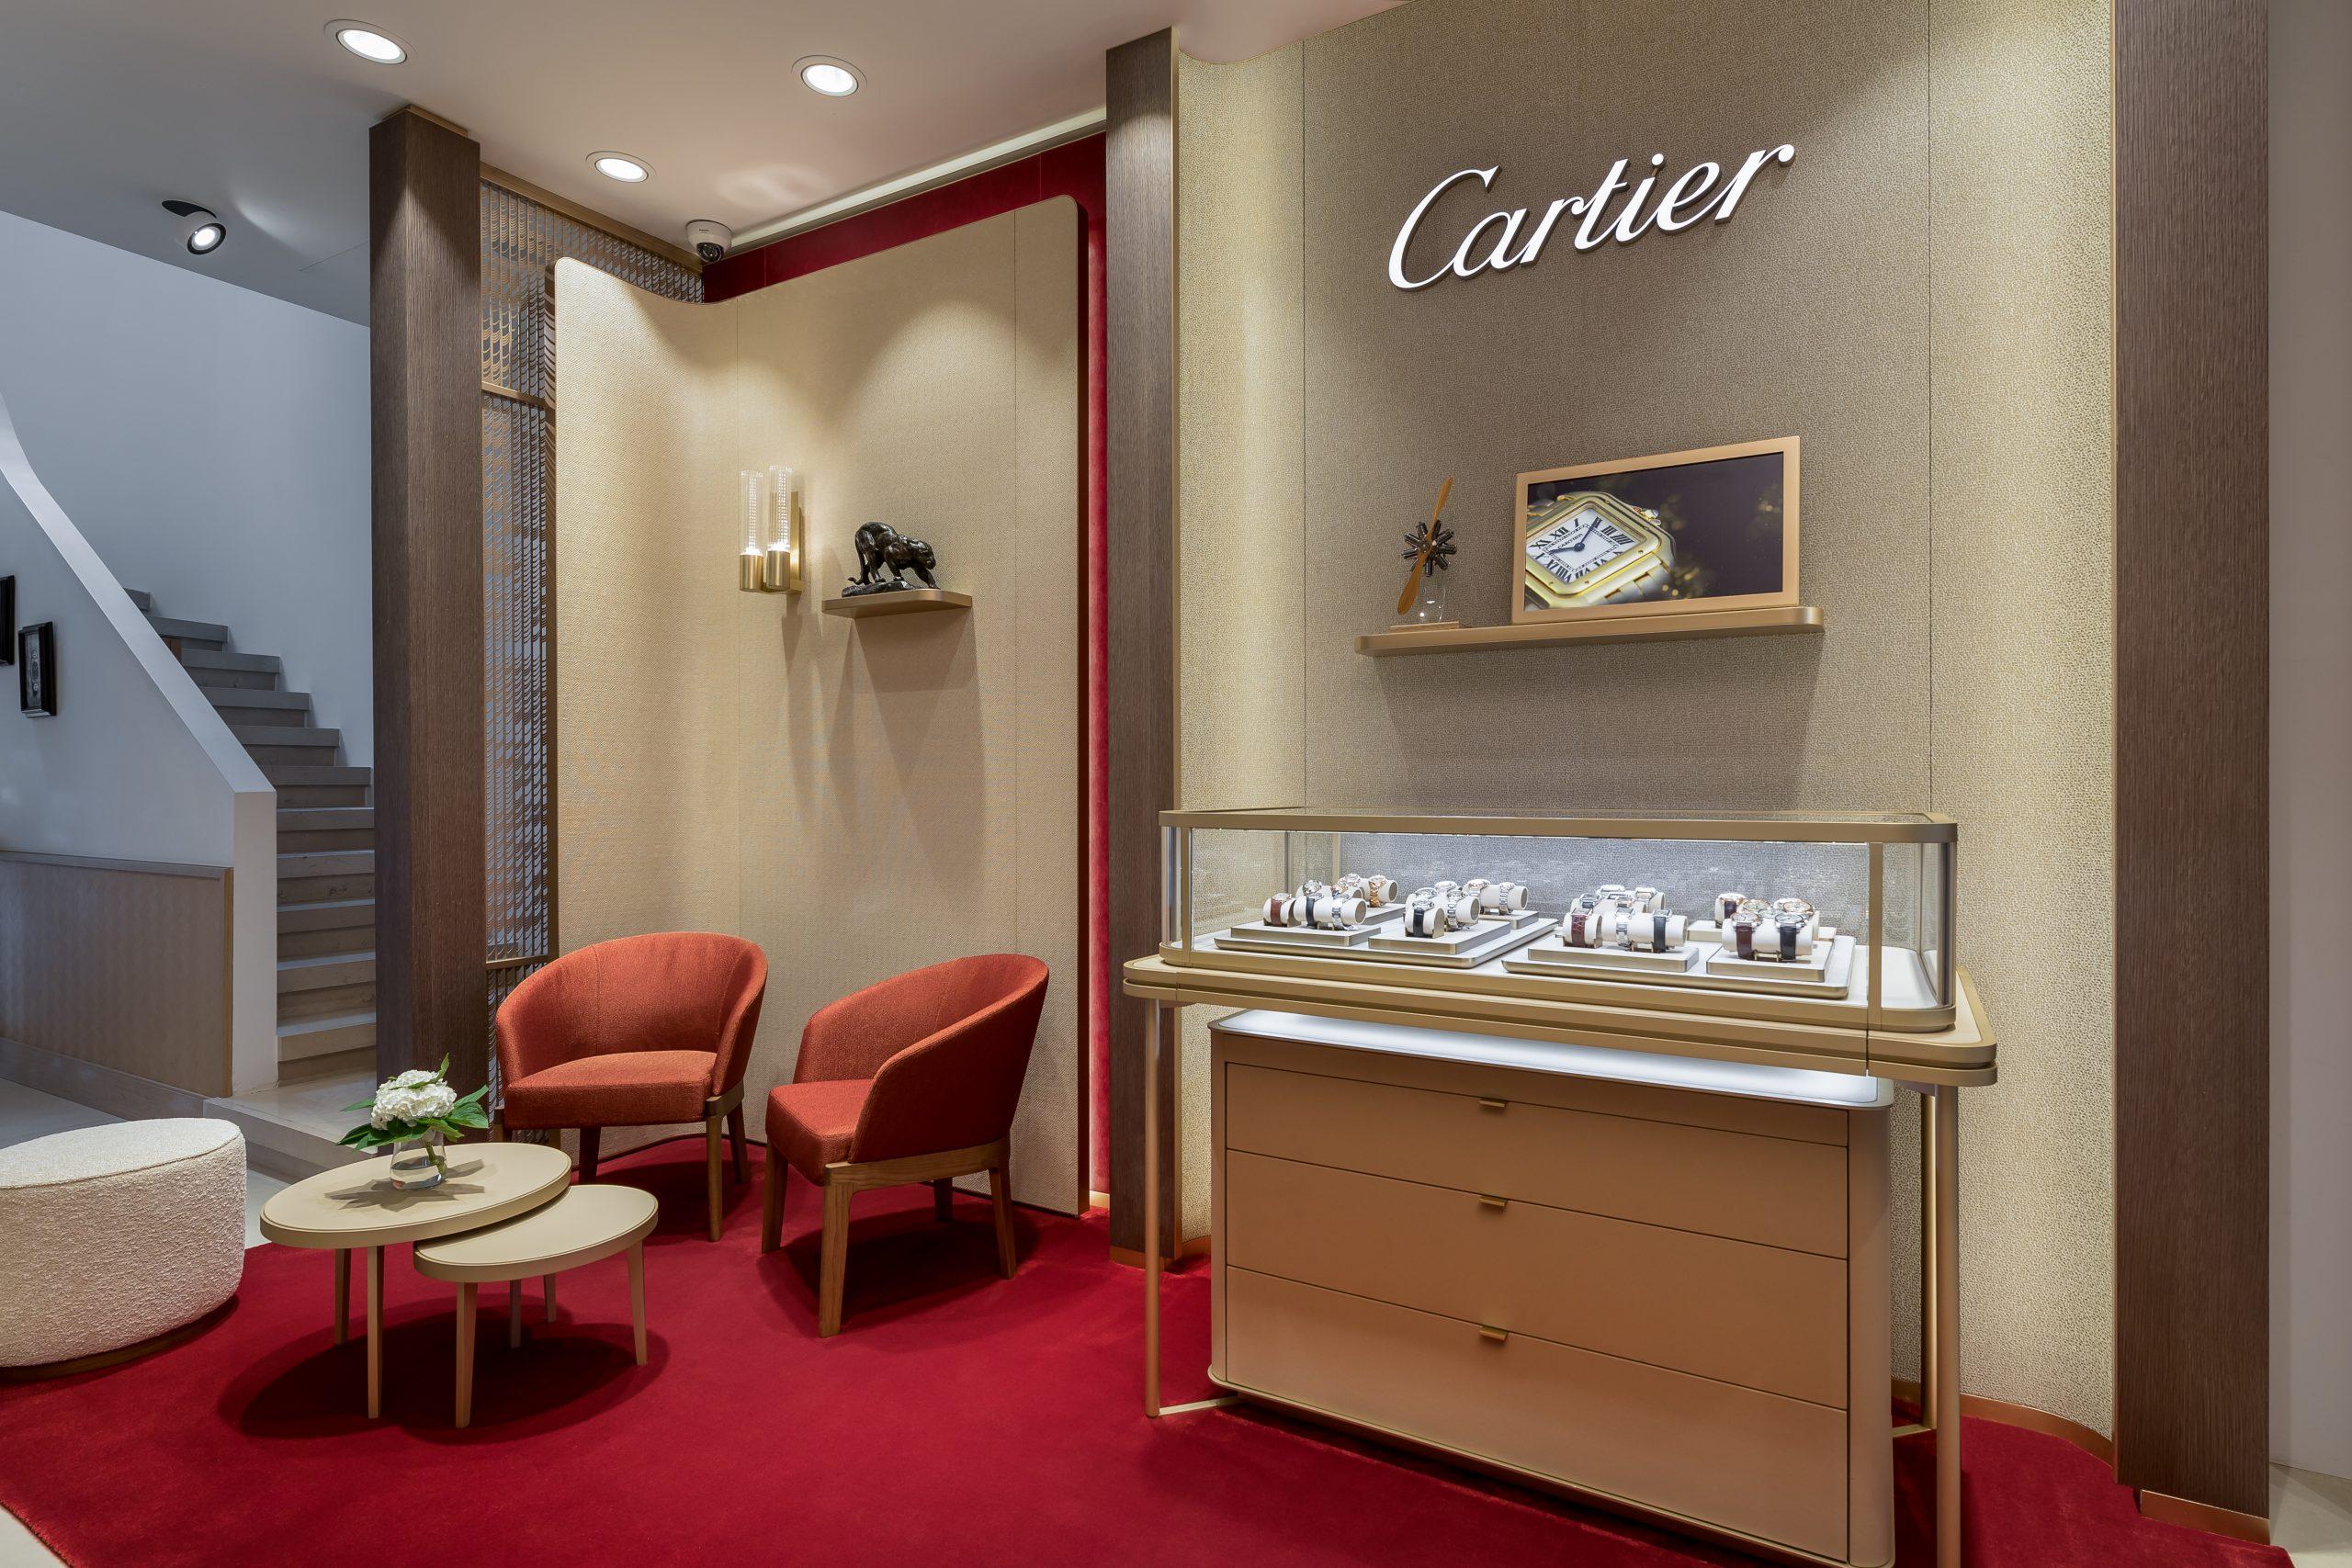 Cartier-Desitter-Liege-2020-4